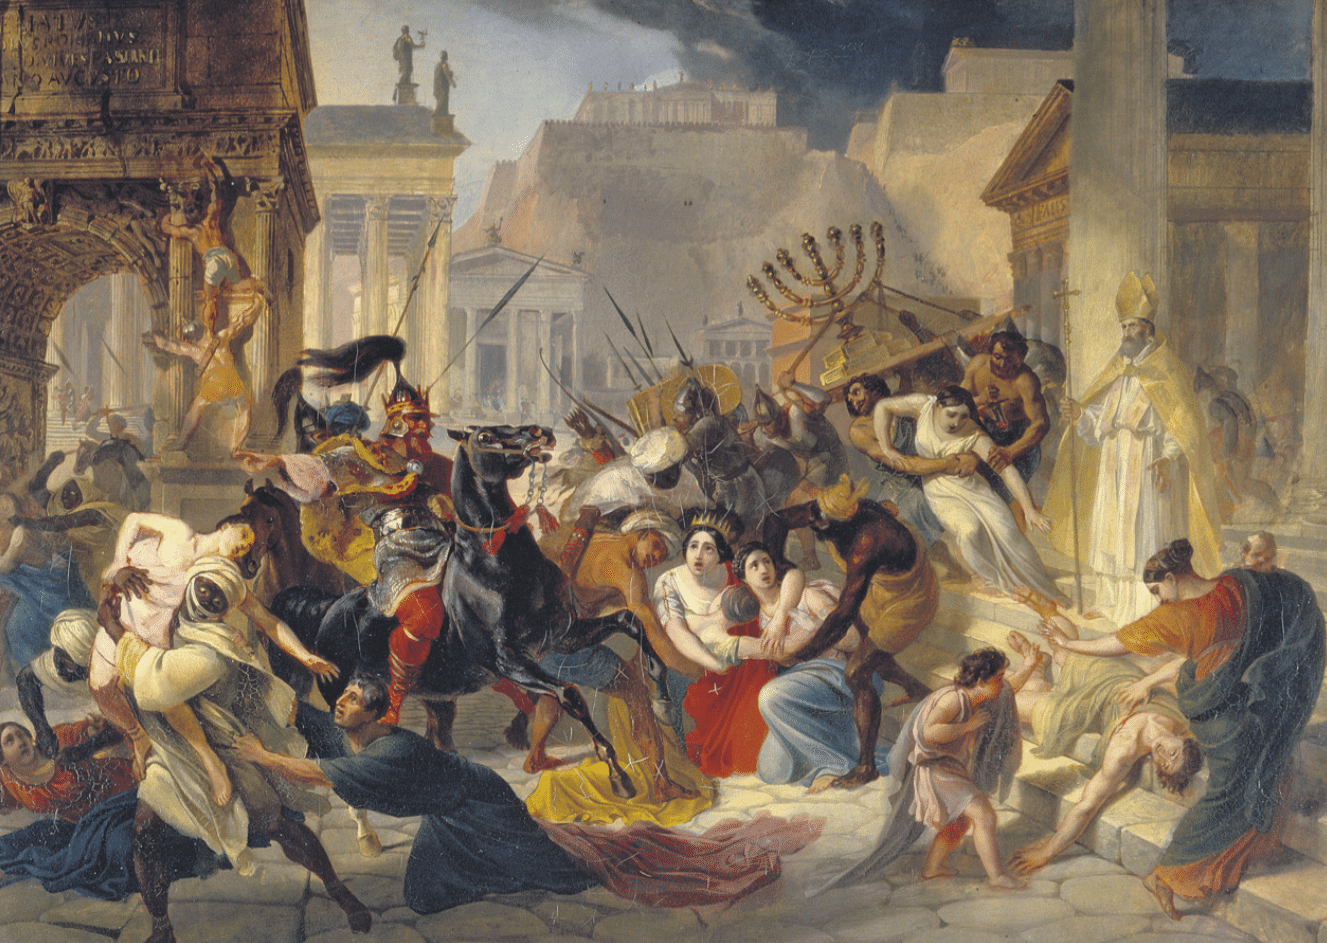 Bertrand Lançon, La chute de l'Empire romain. Une histoire sans fin